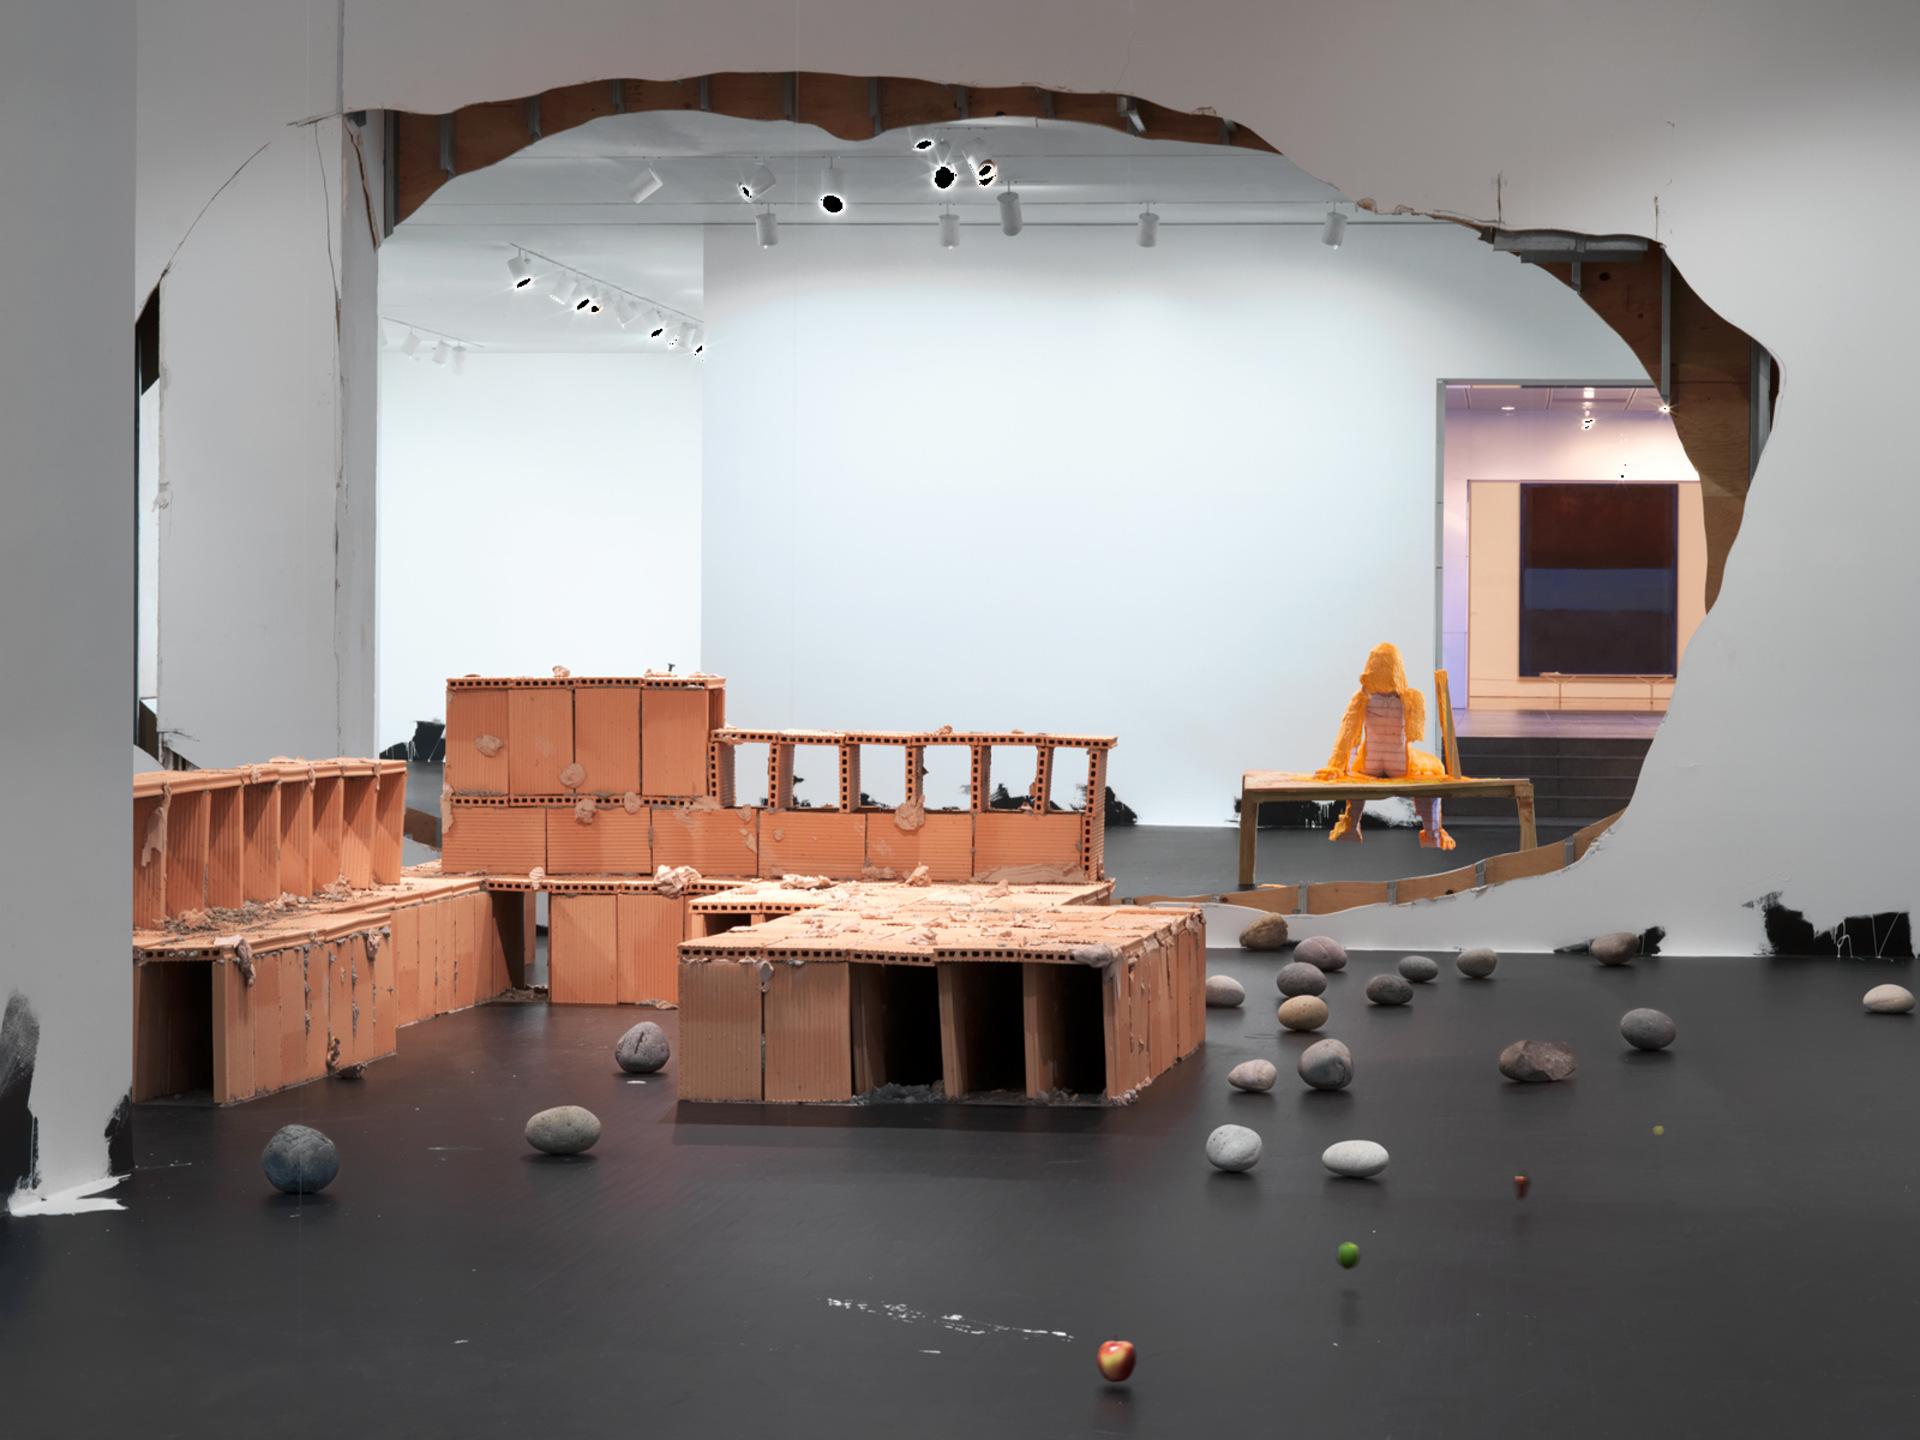 Untitled (50 Rocks); Skelett; Untitled (Suspended Line of Fruit); Portrait of a Single Raindrop; Untitled (Nude on a Table): Untitled (Floor Piece)